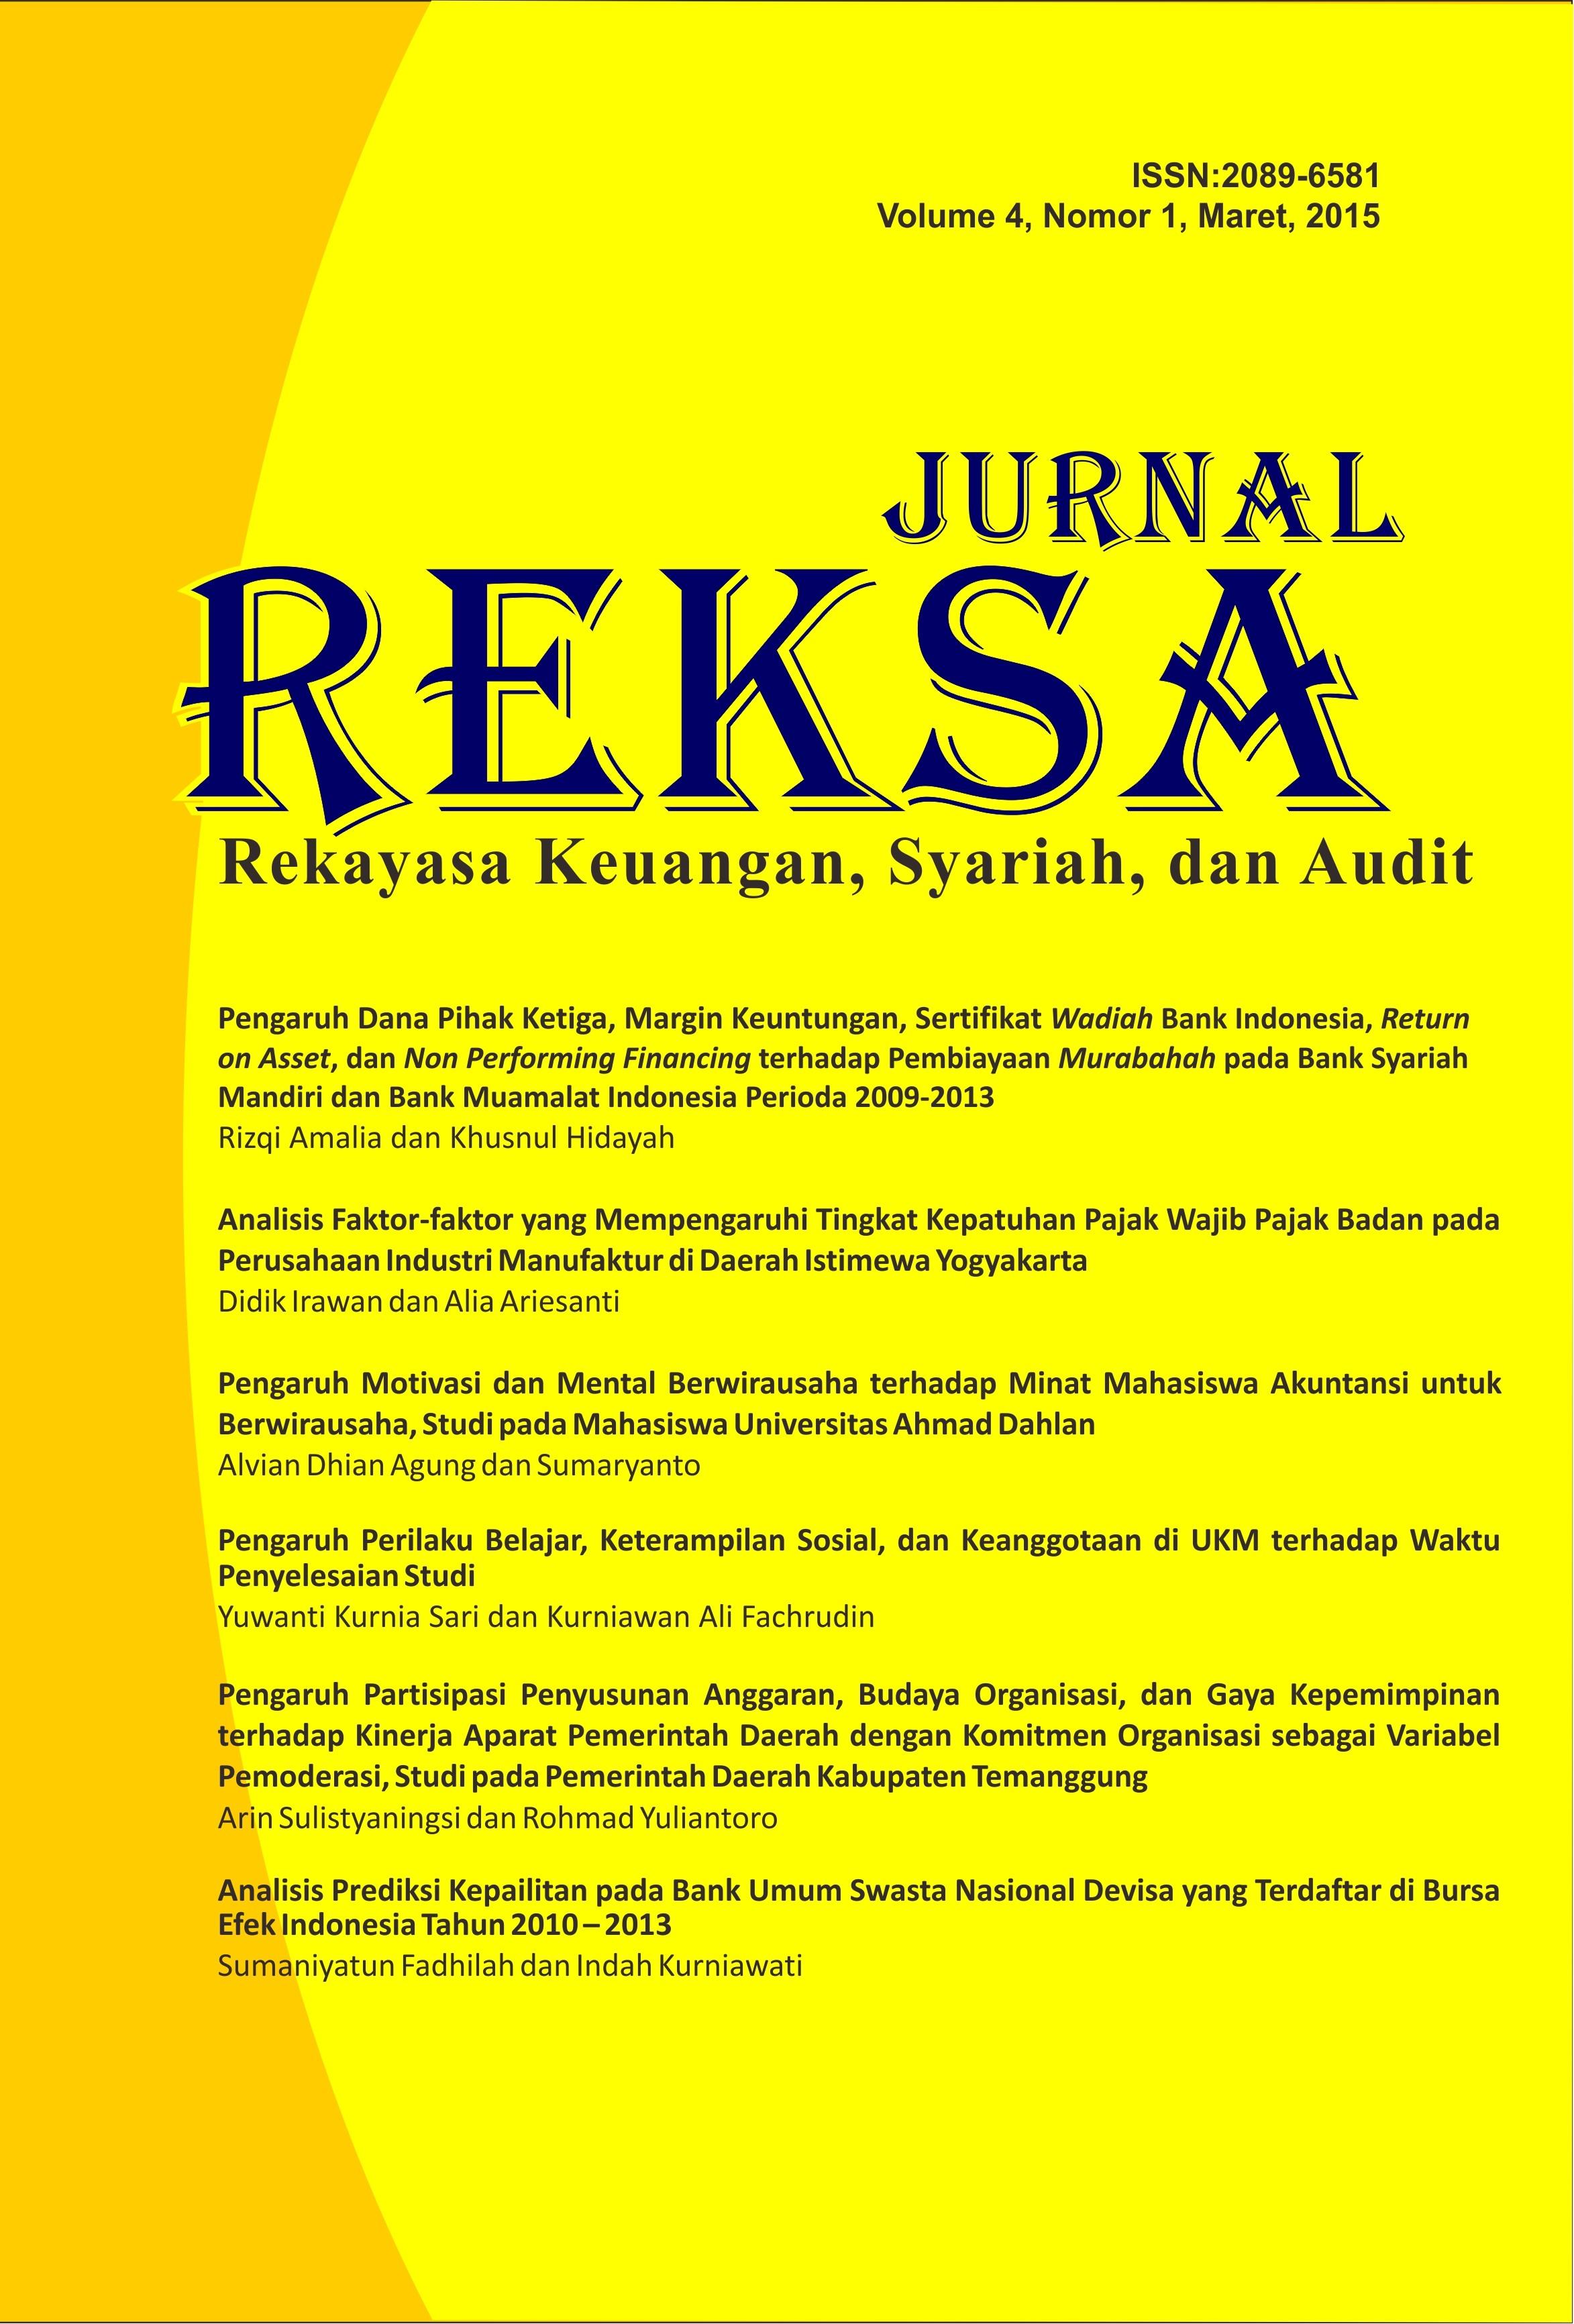 JURNAL REKSA